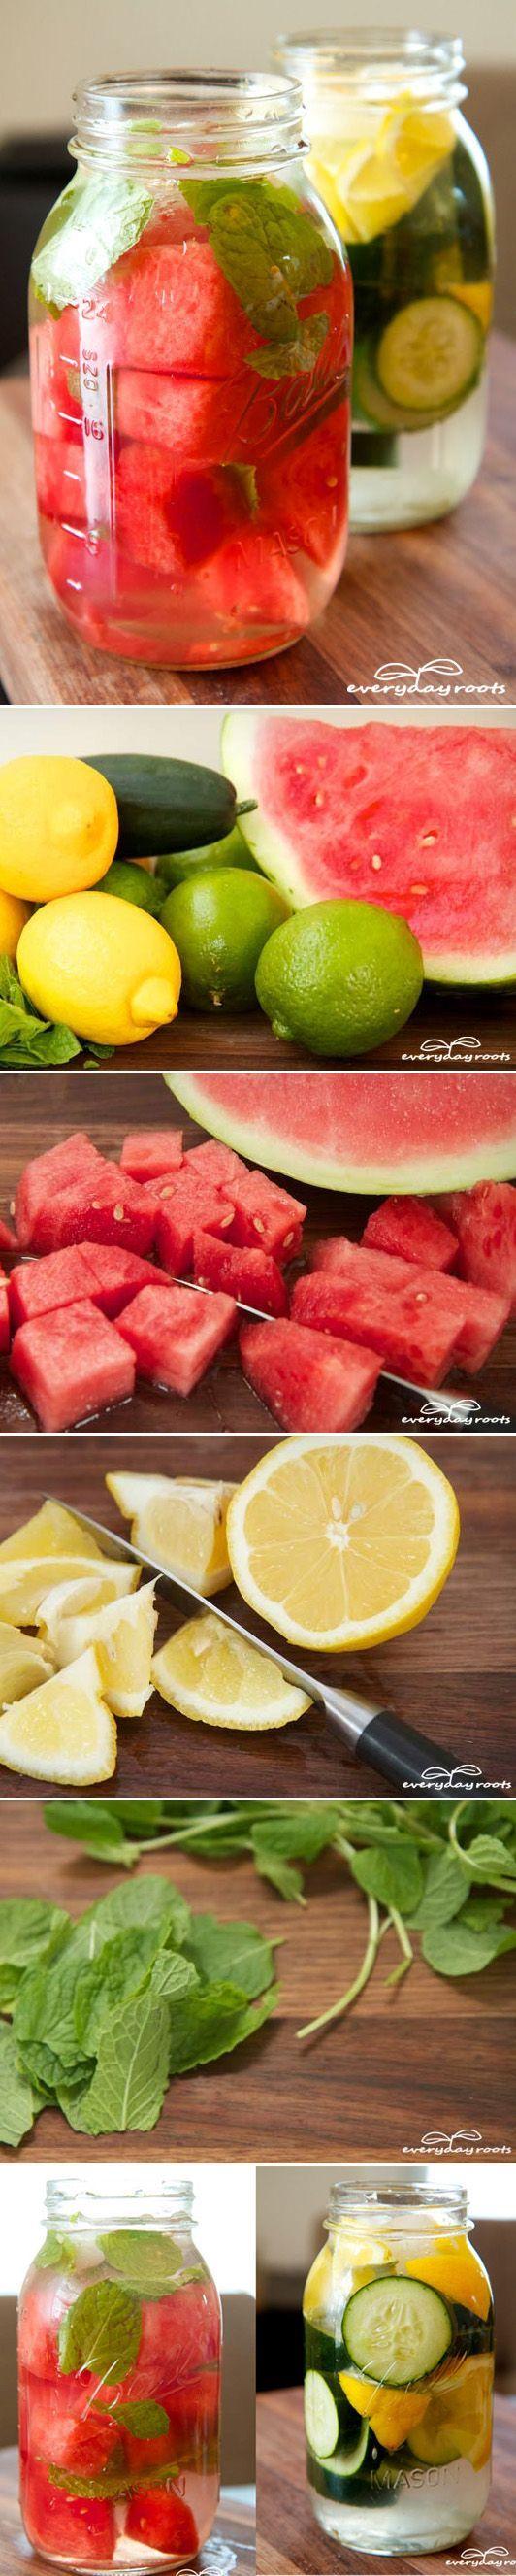 fast weight loss lemon detox recipe